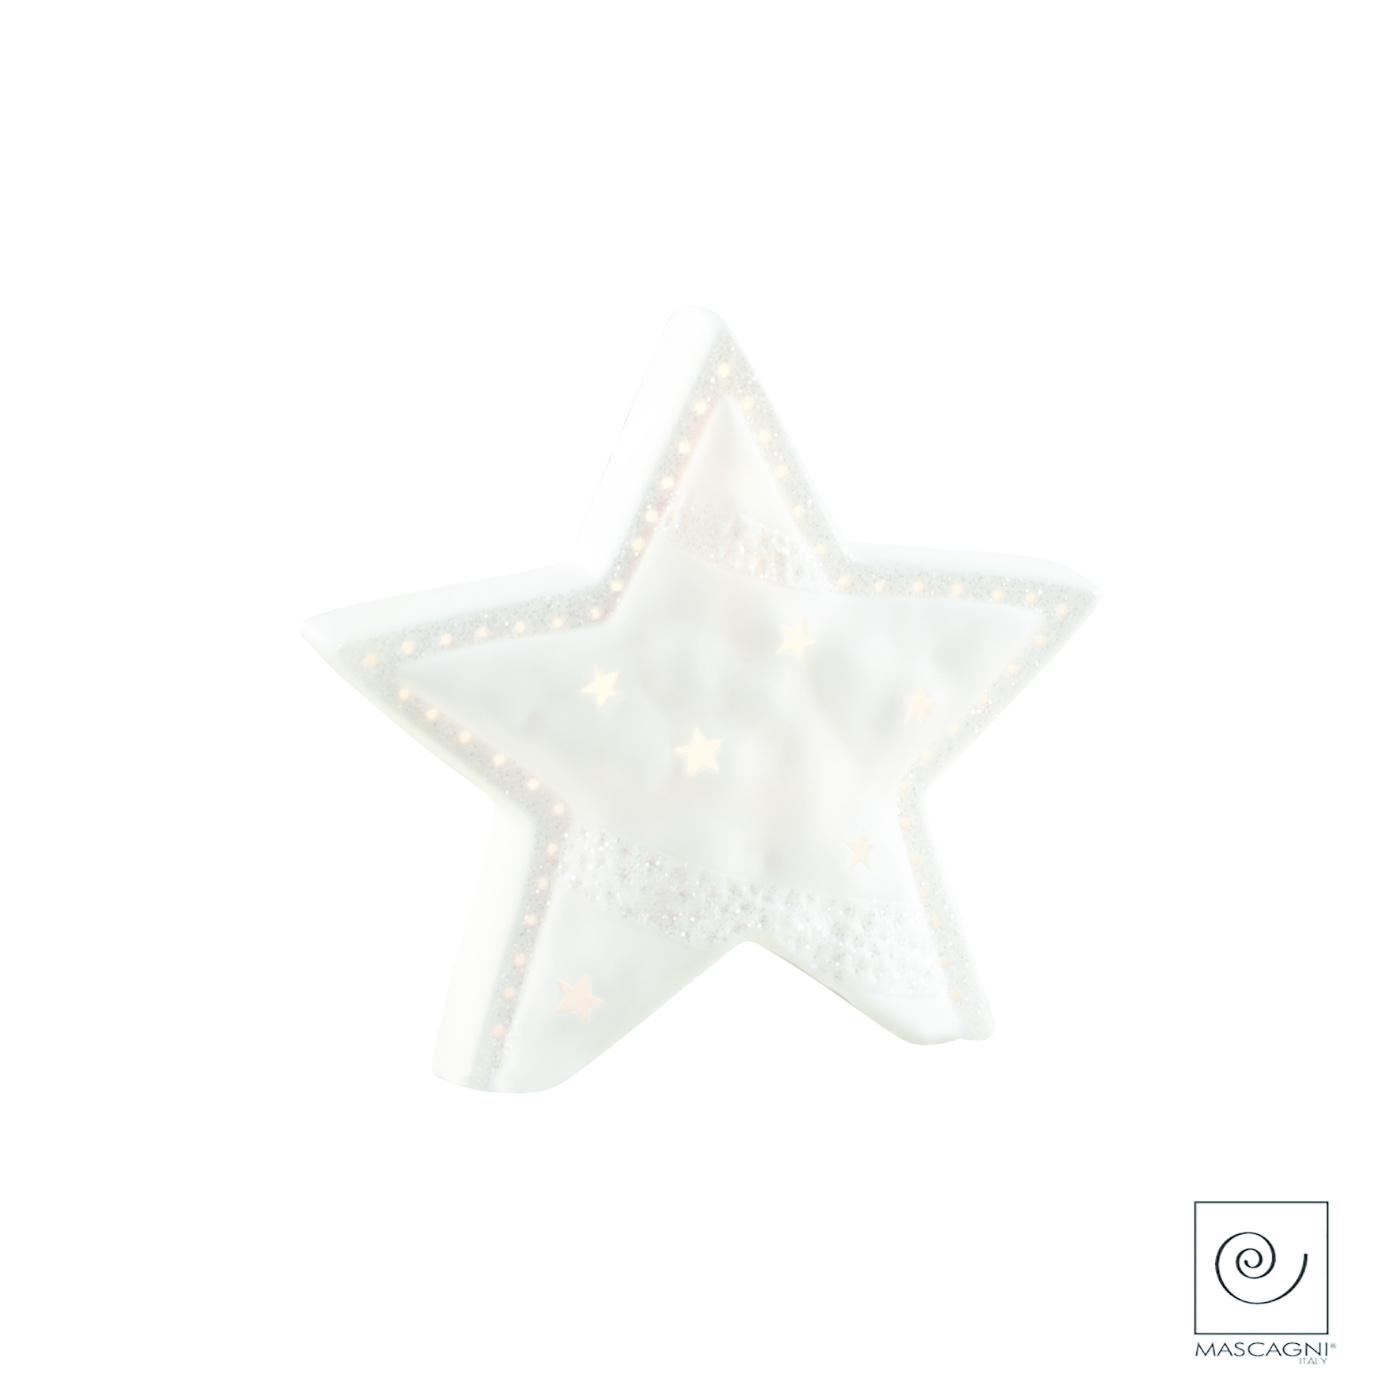 Art Mascagni LED STAR CM.15